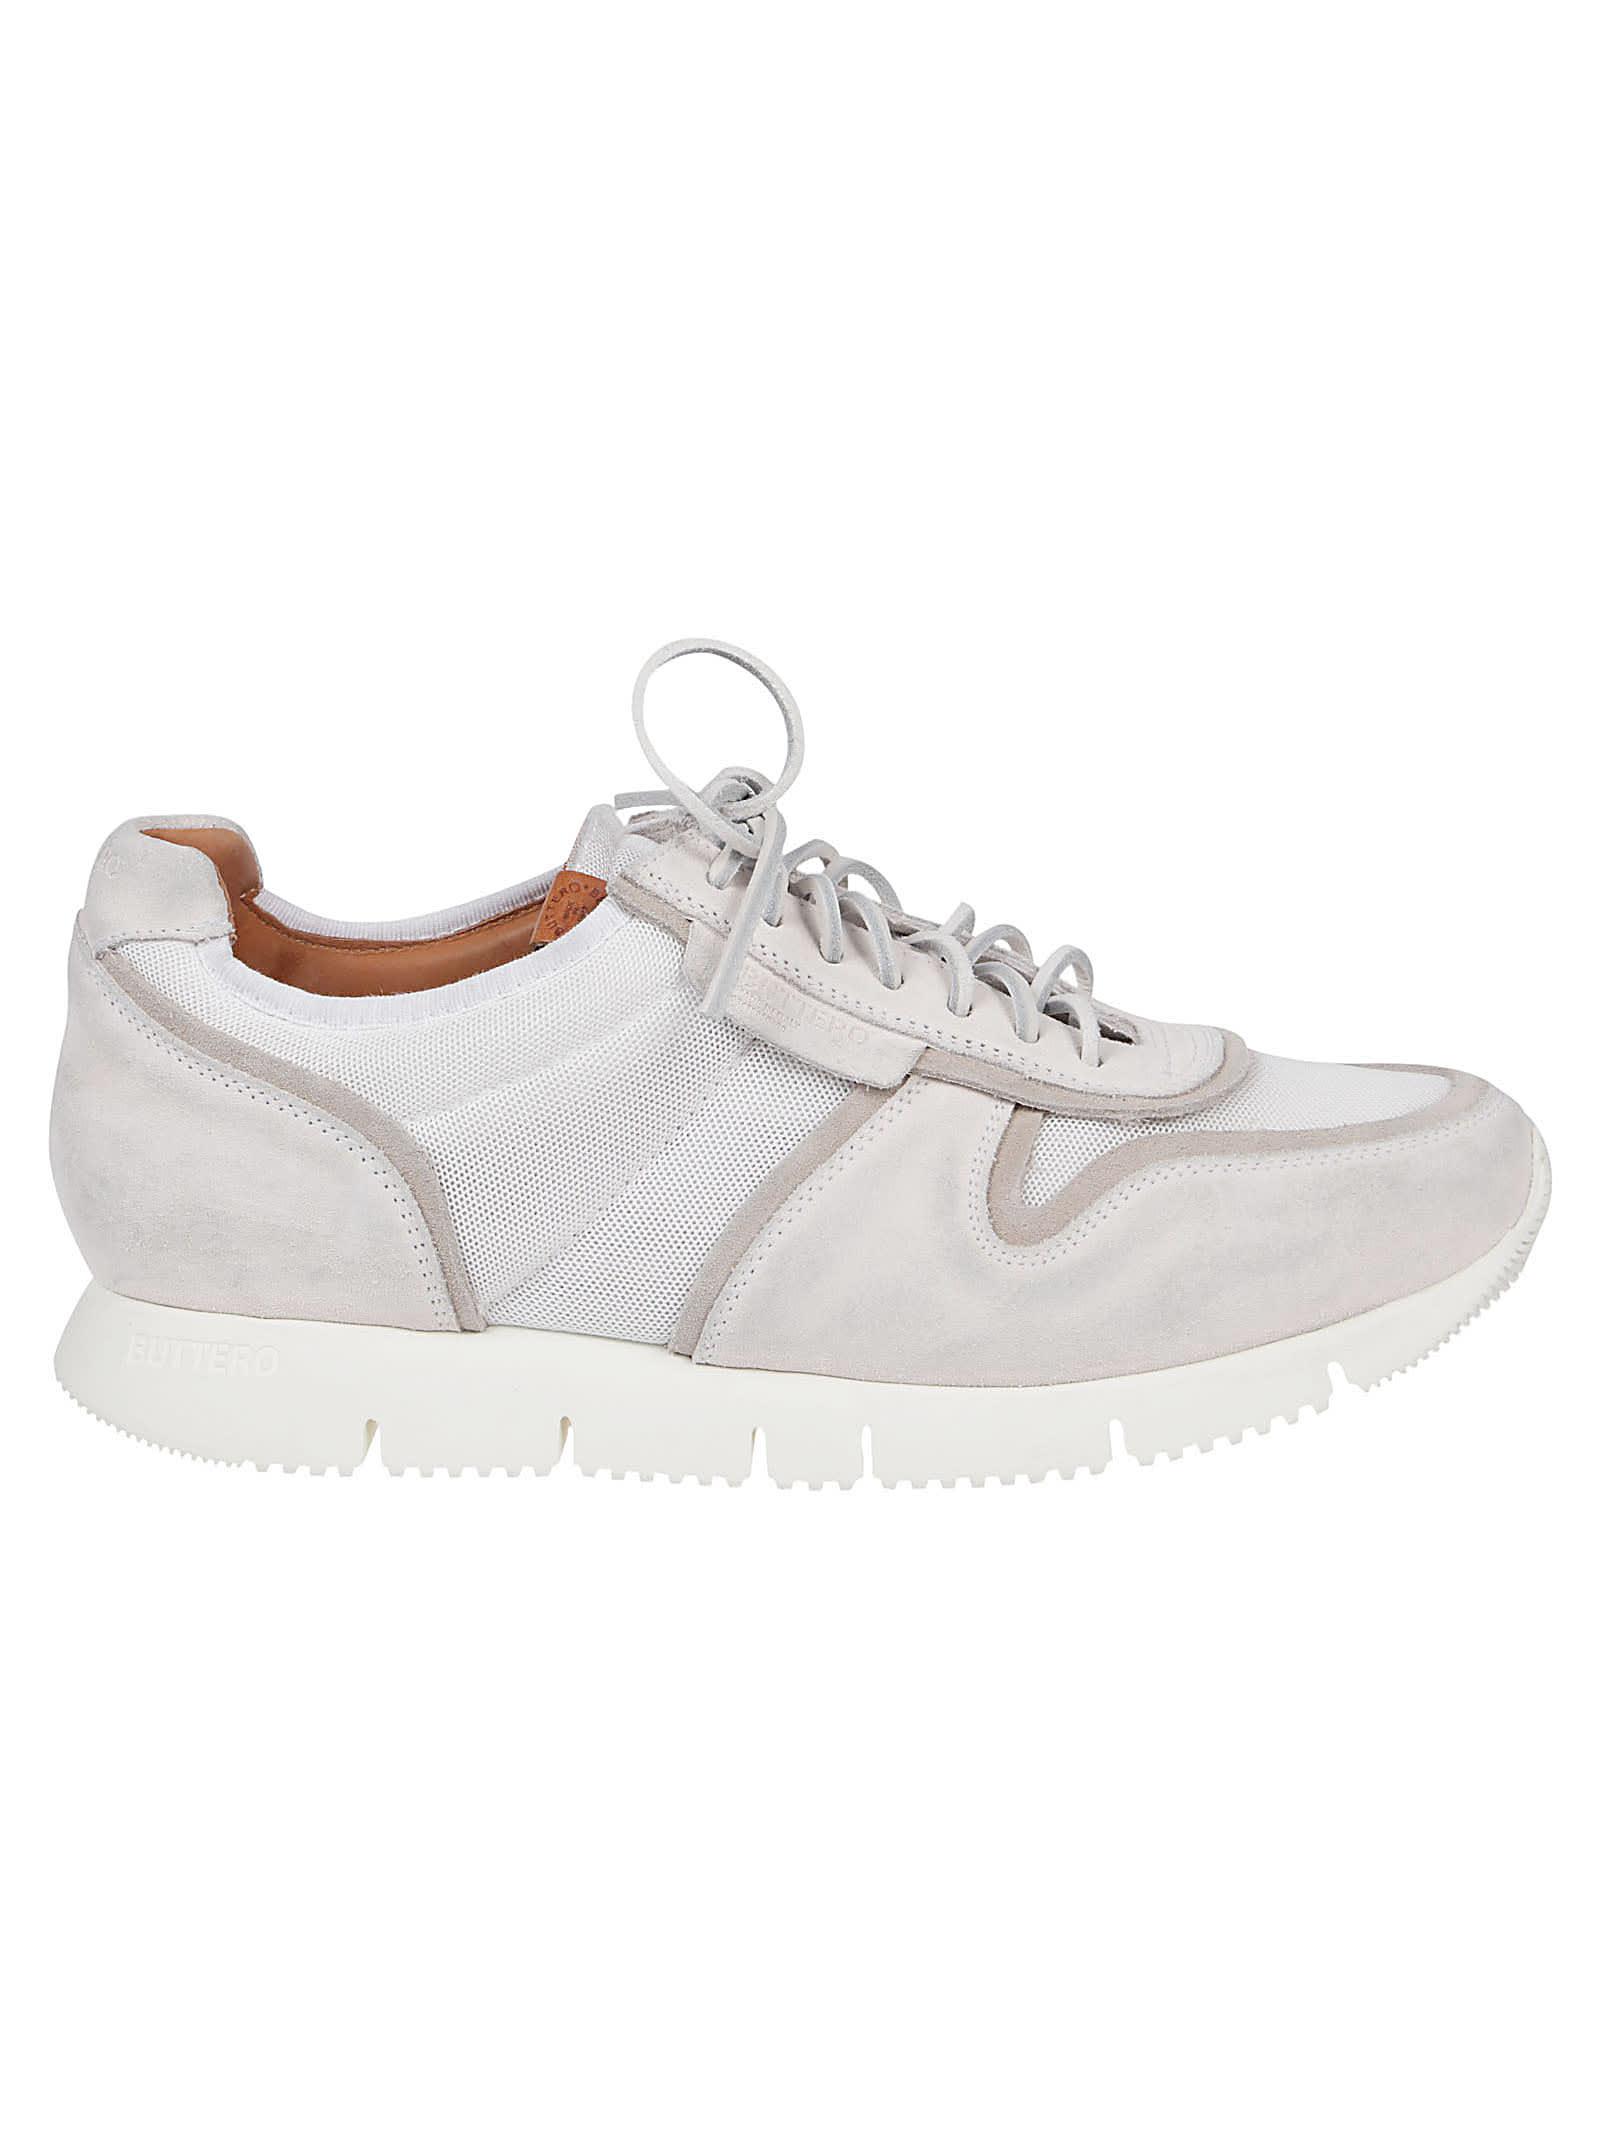 Buttero Sneaker Carrera